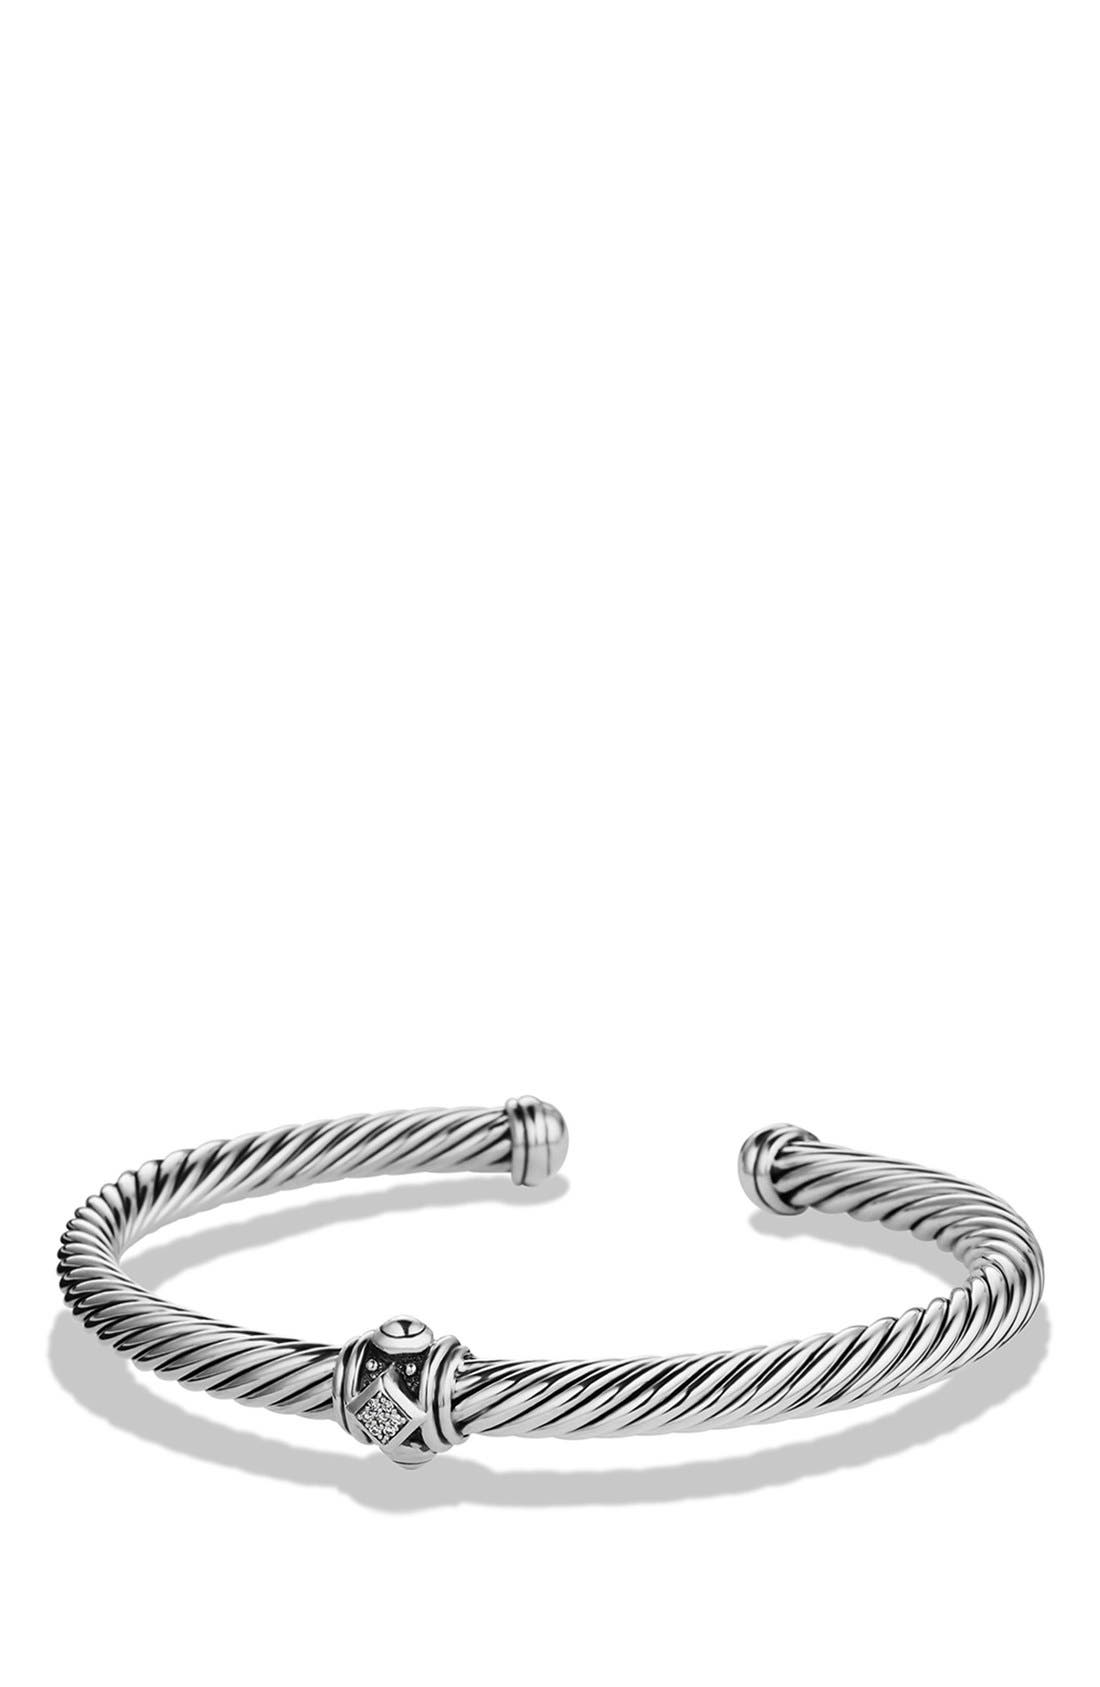 Main Image - David Yurman 'Renaissance' Bracelet with Diamonds